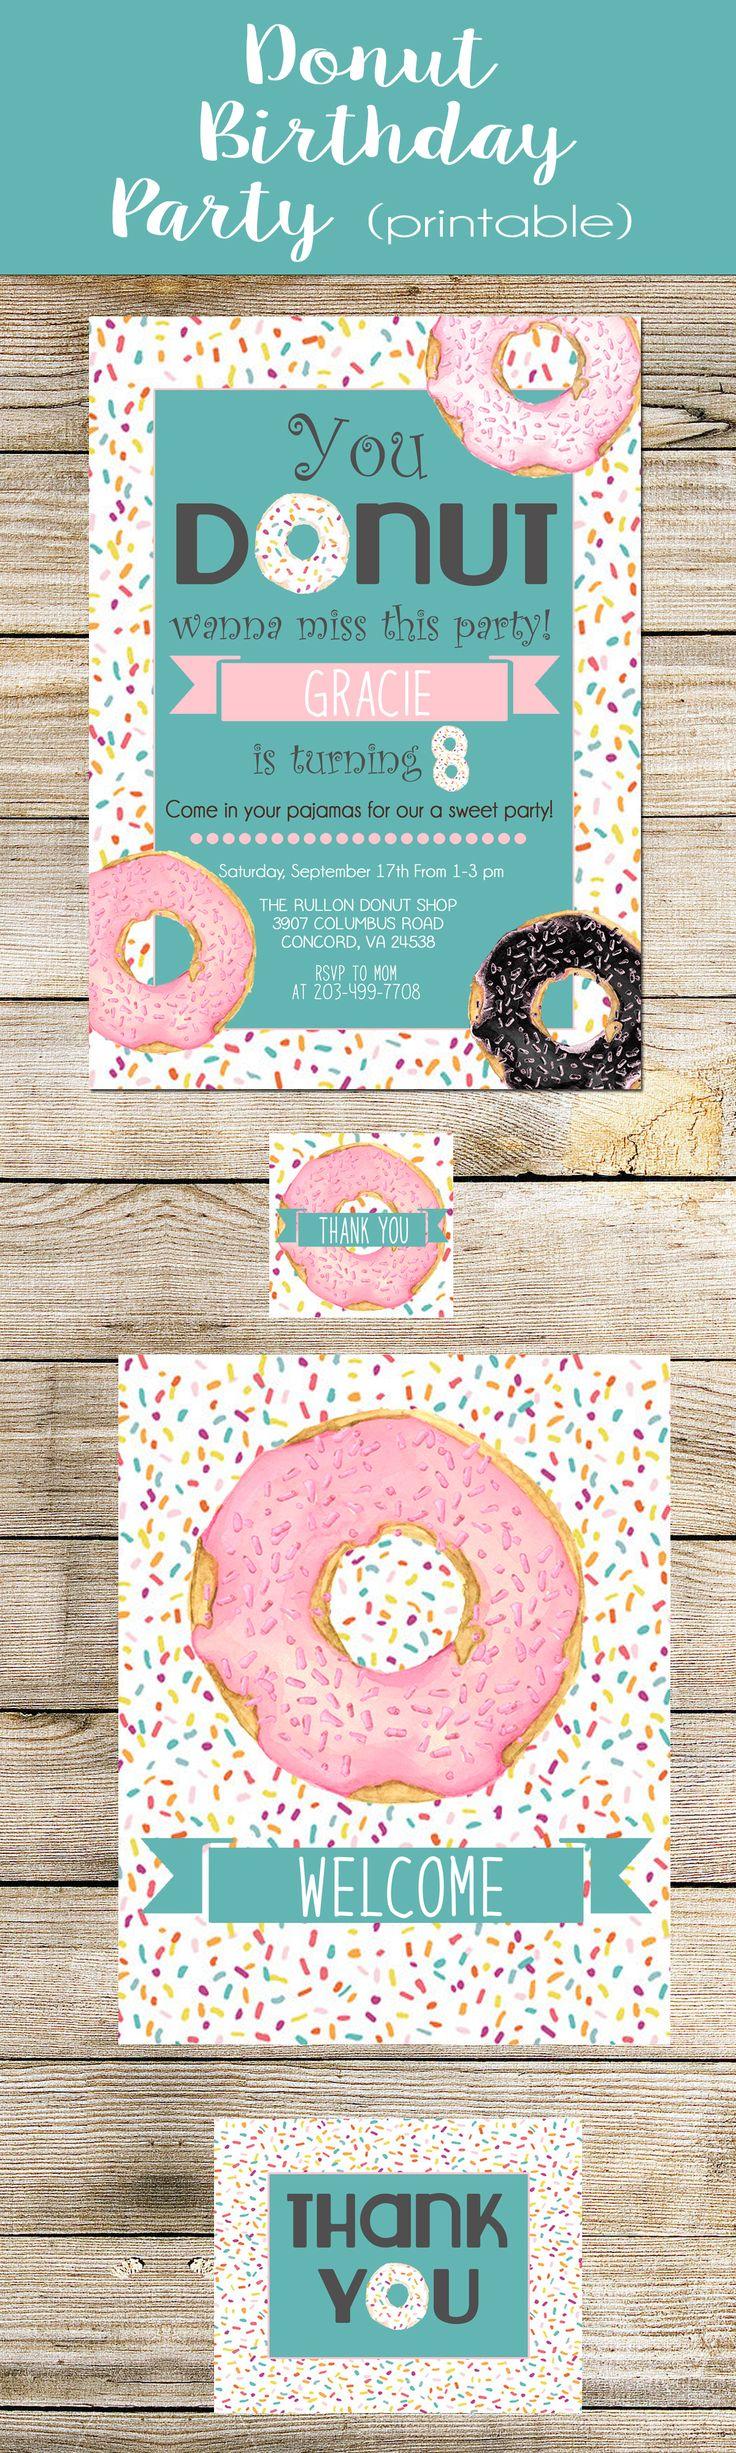 14 best Birthday Party images on Pinterest | Invitation design ...